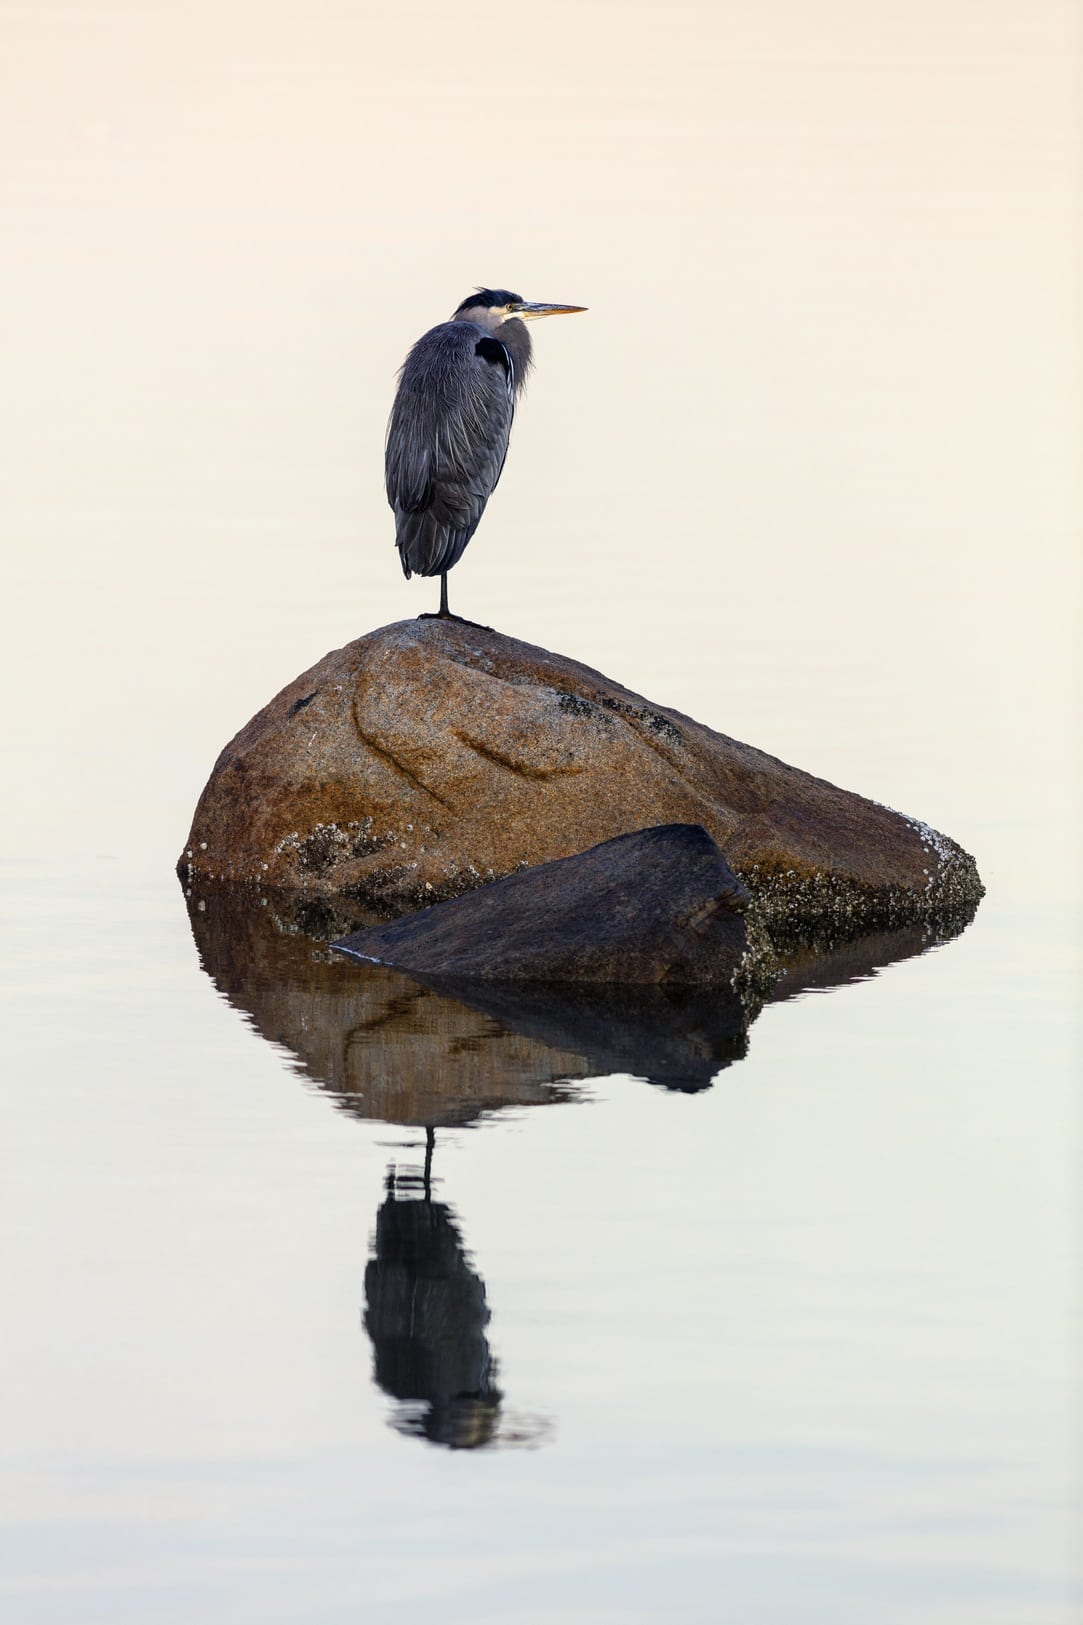 Heron Semiahmoo Spit Bird Watching David Jolly Whatcom County Bellingham Washington 1 22